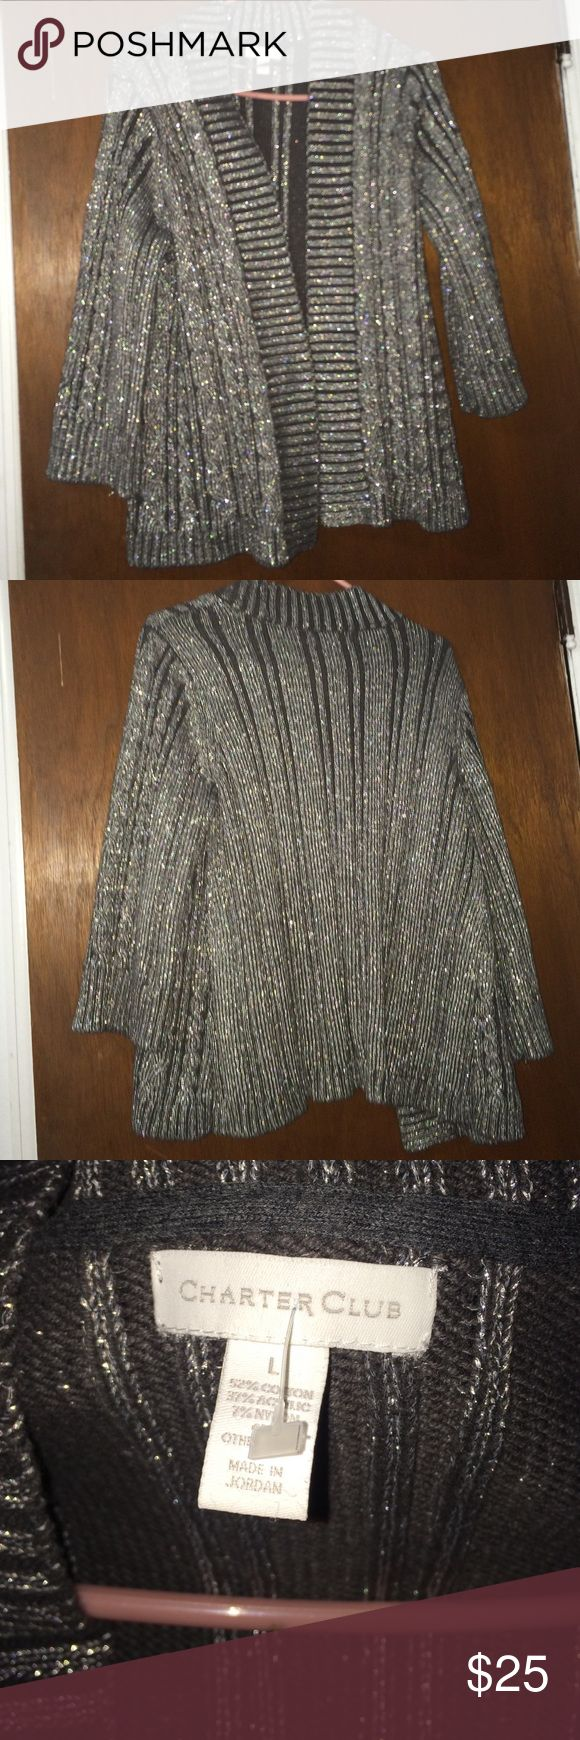 Silver cardigan Sparkly black & silver cardigan. Charter Club Sweaters Cardigans